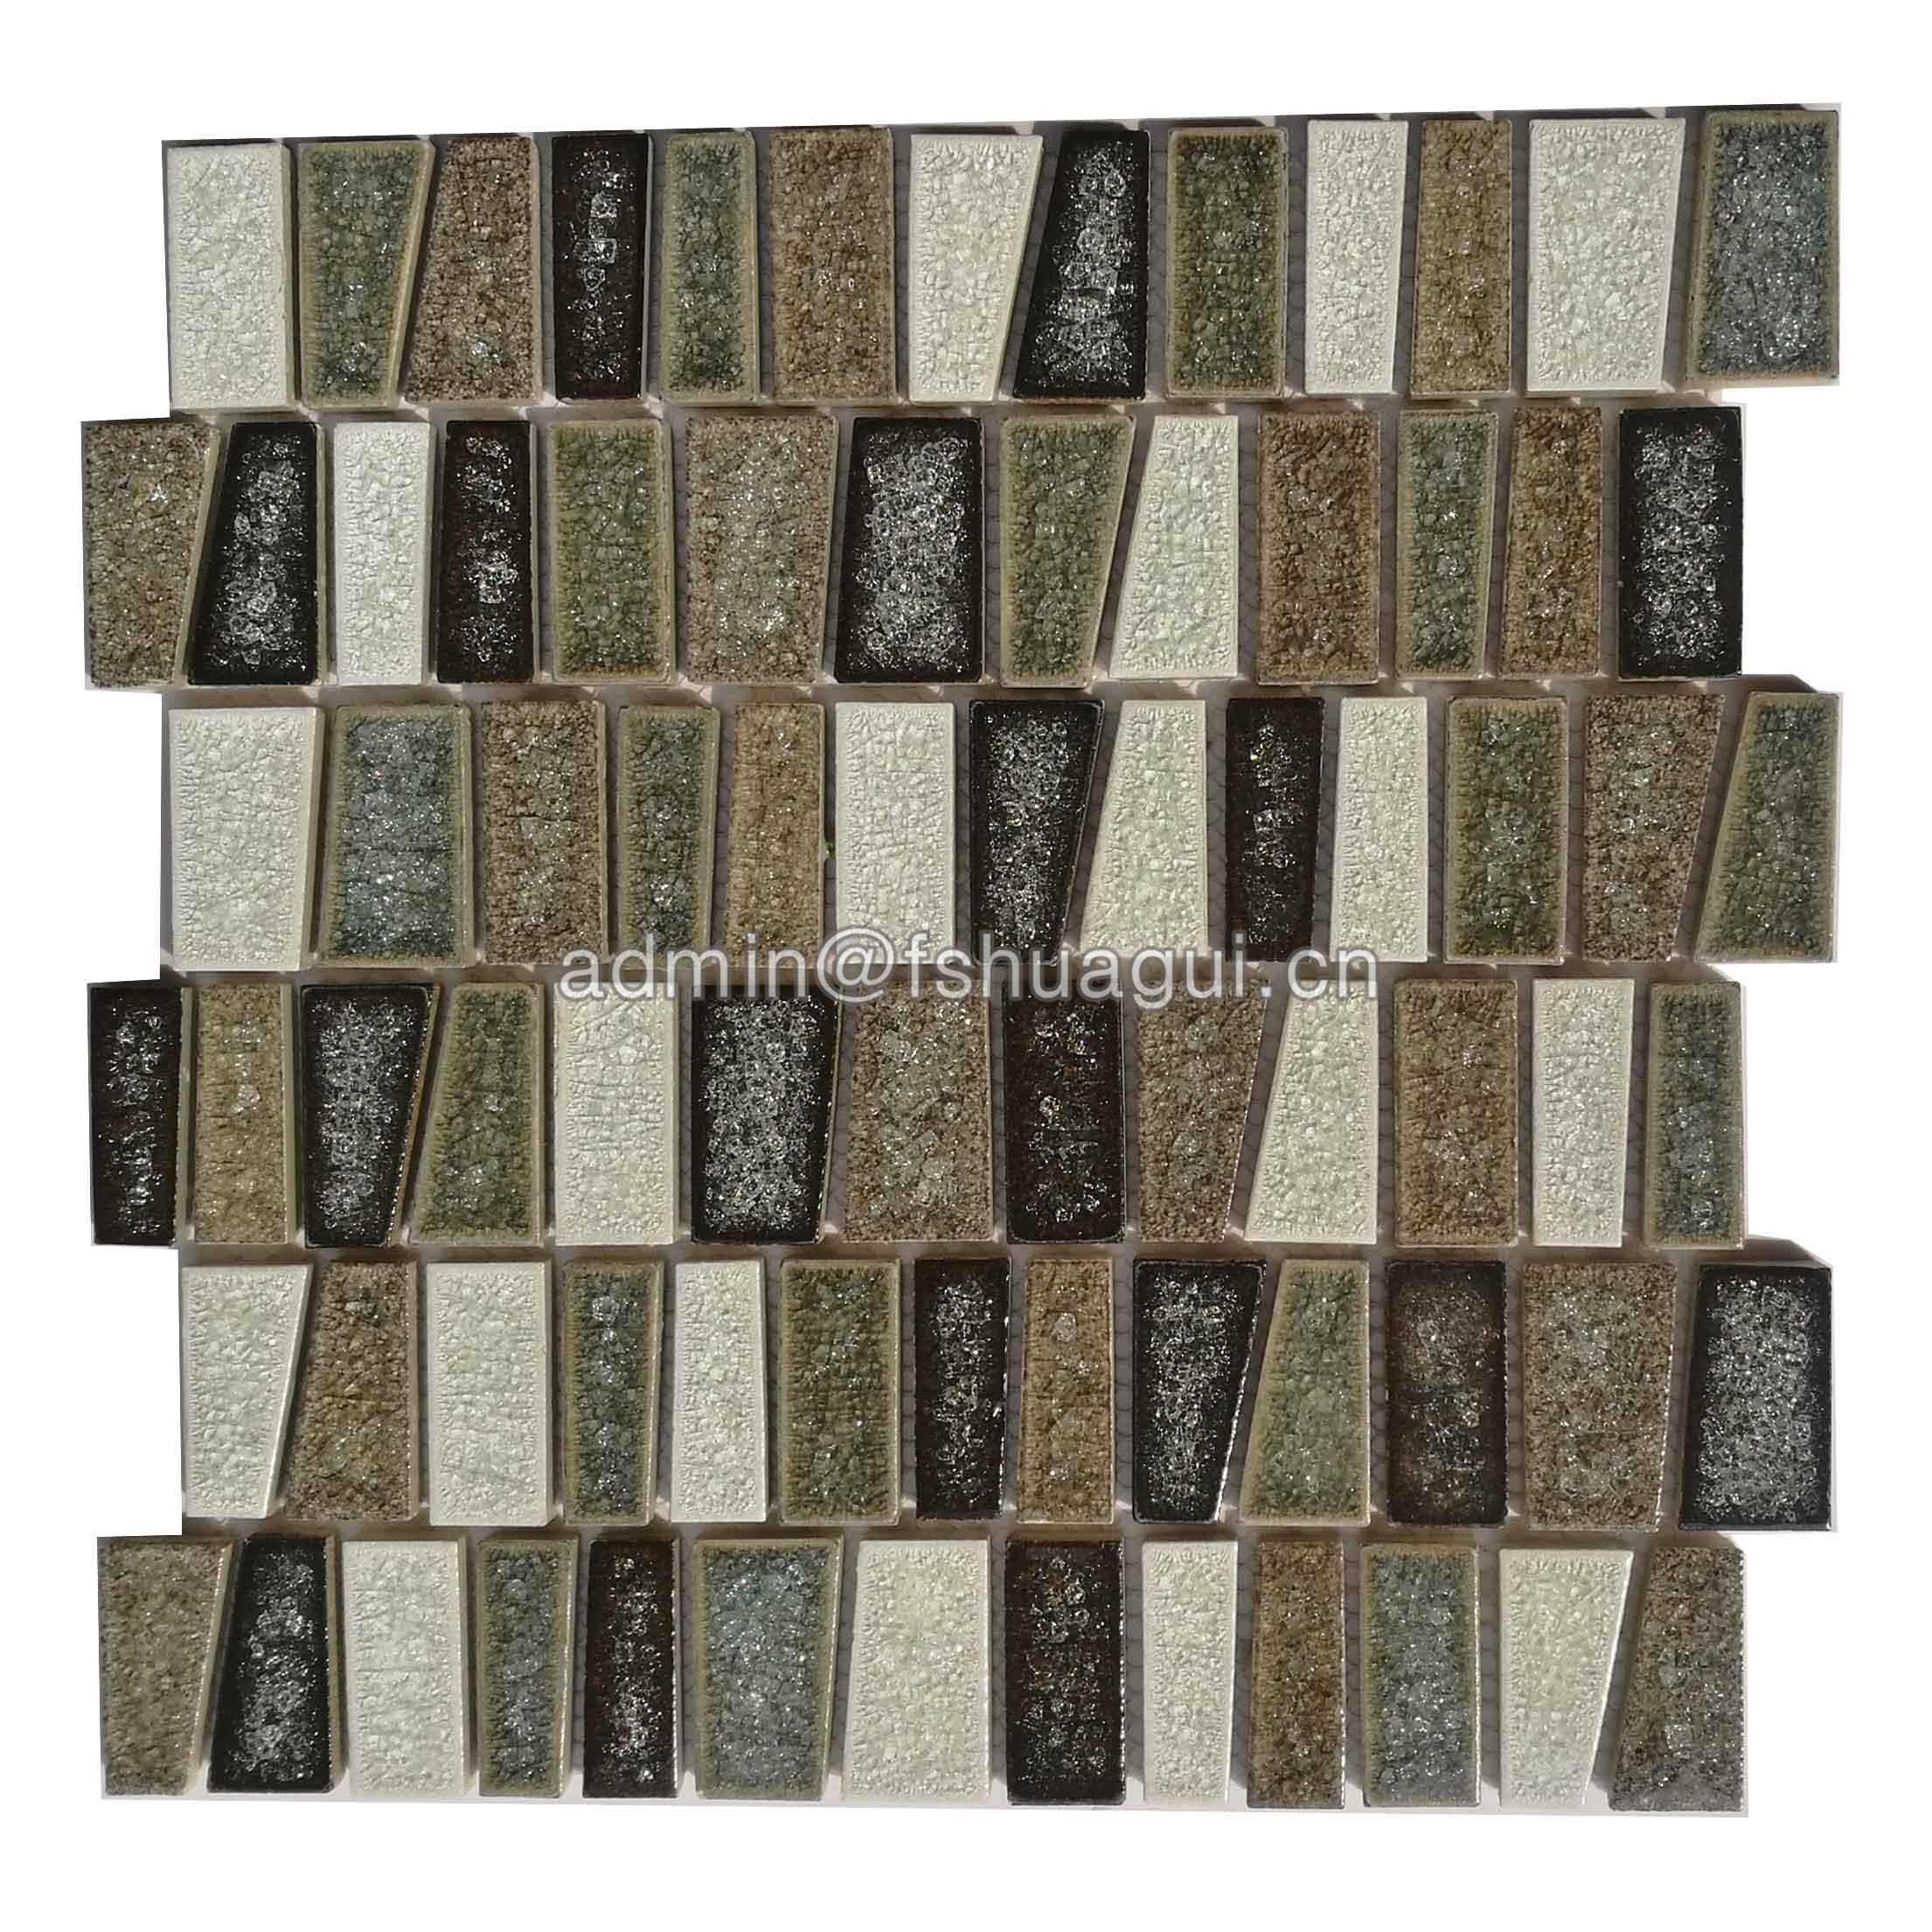 Huagui Ceramic Mosaic Tile HG-IC008 CERAMIC MOSAIC TILE image7